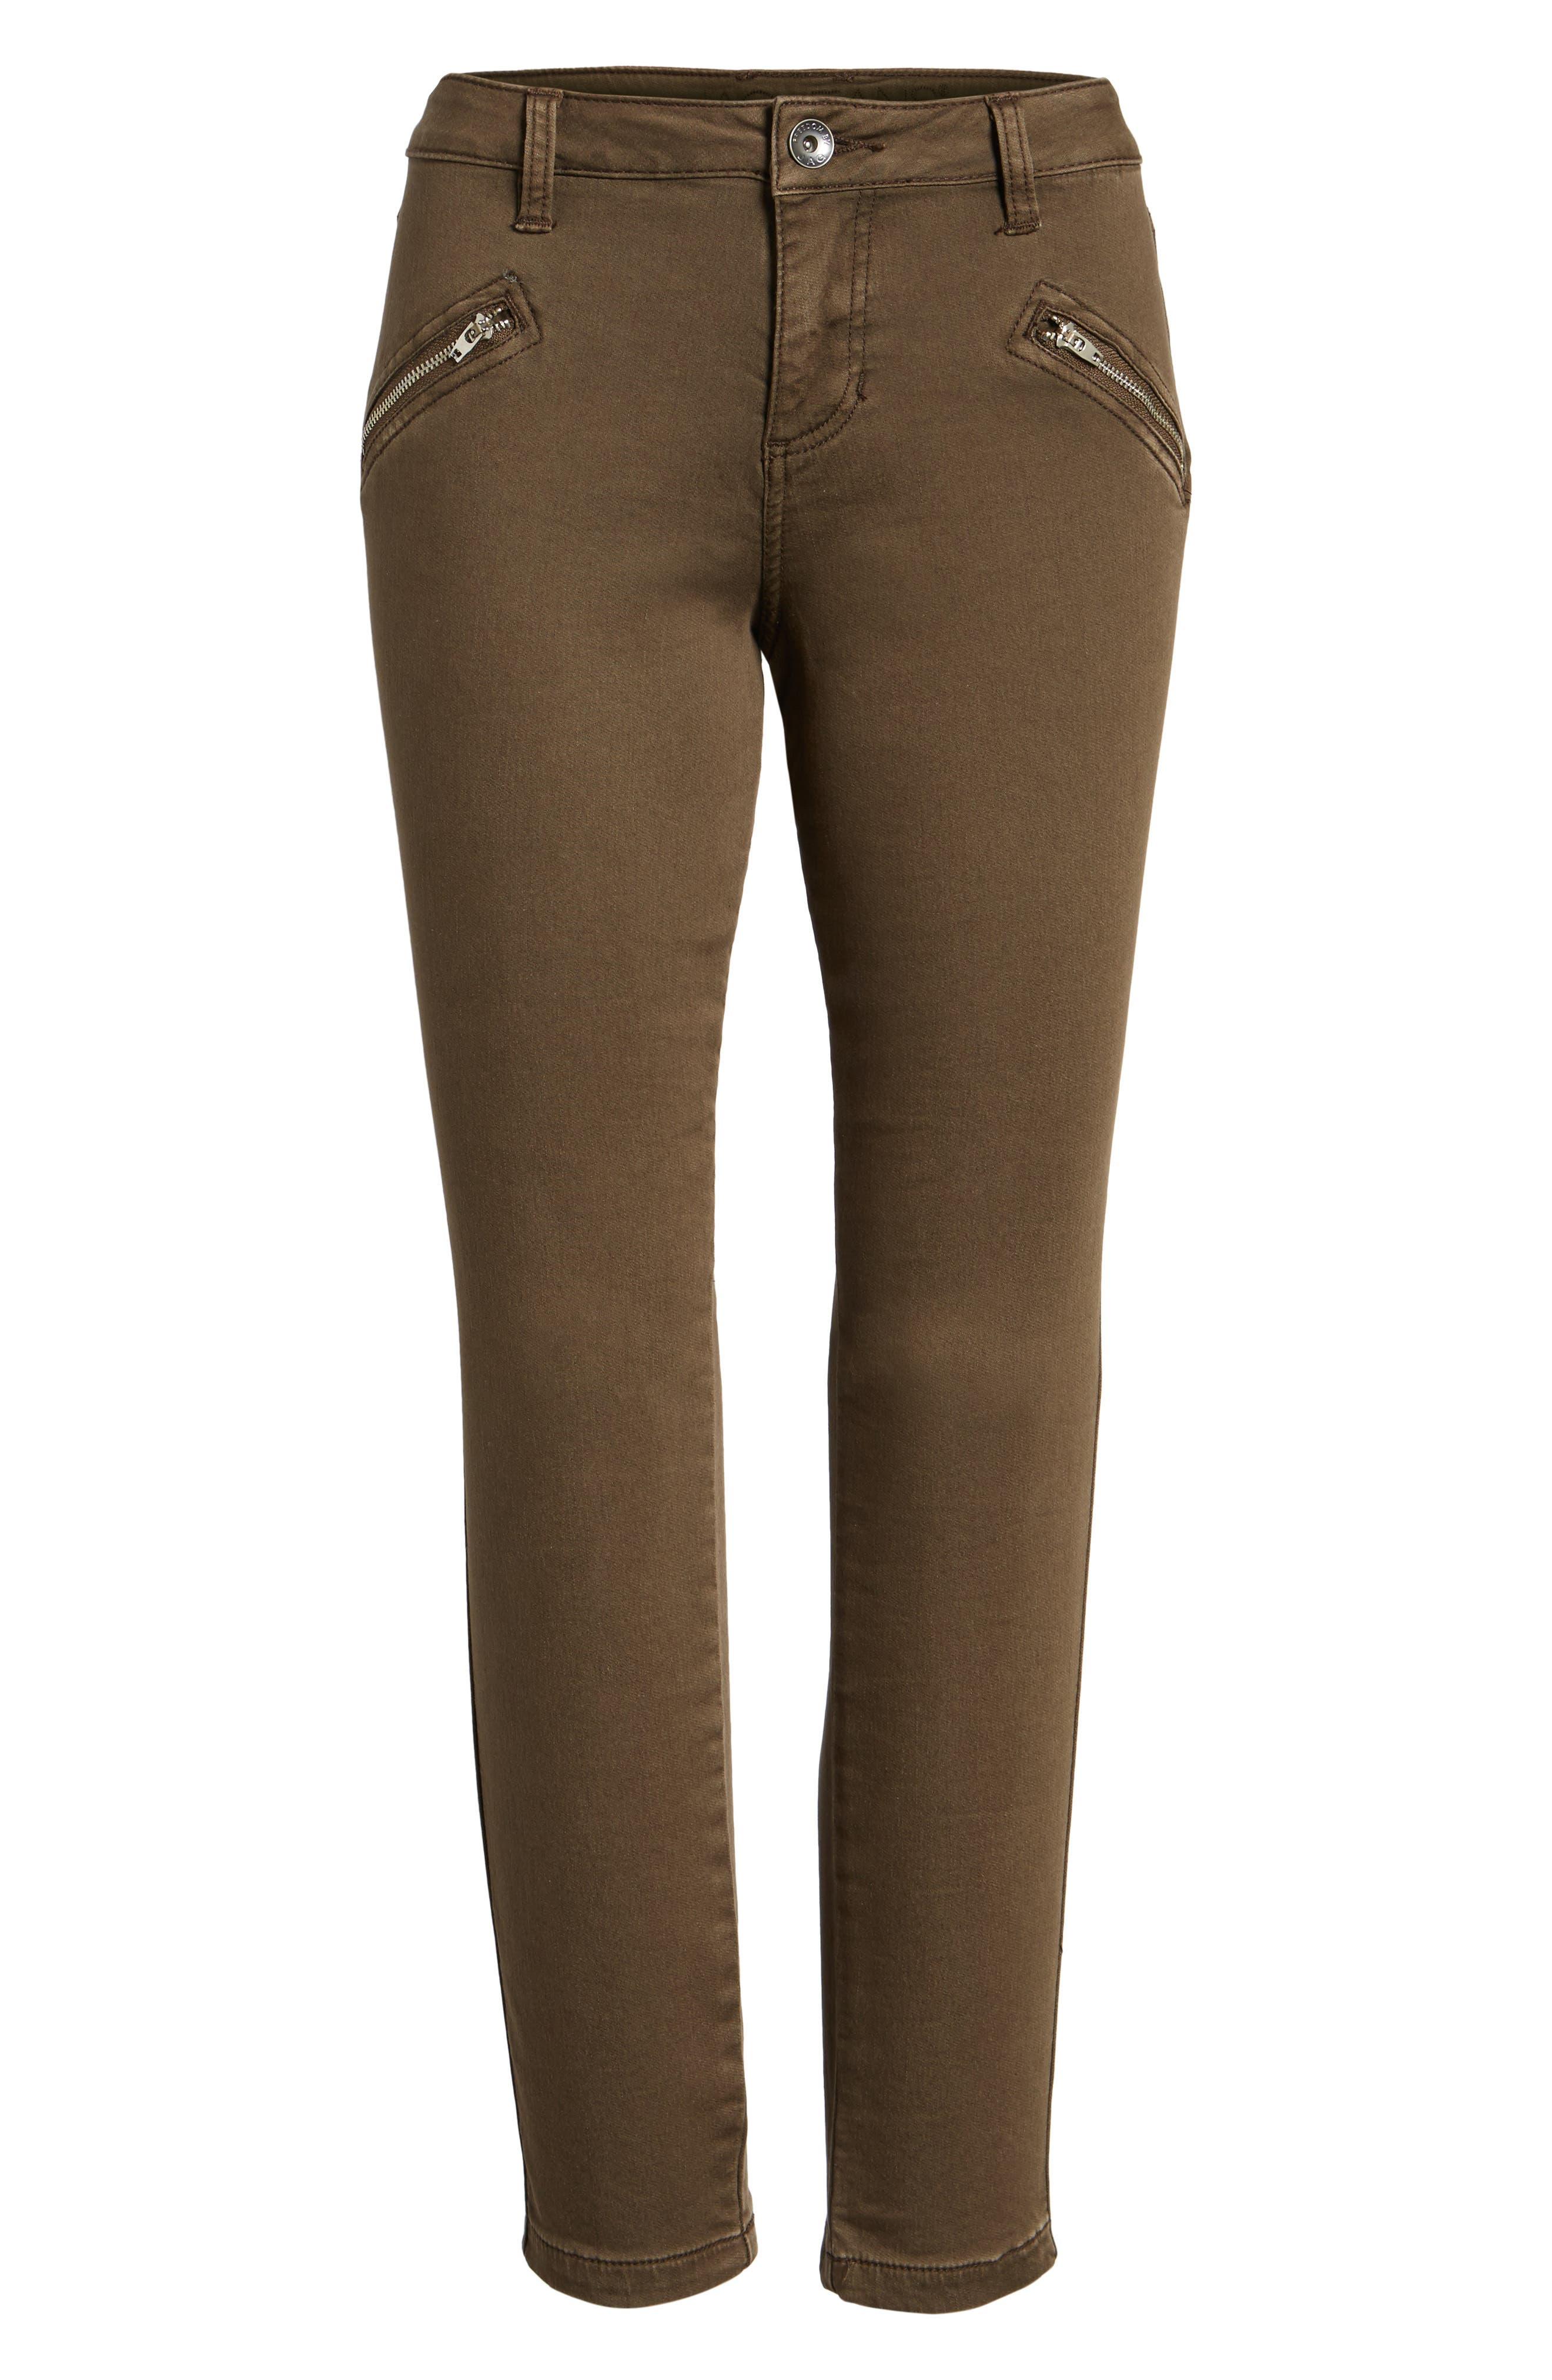 Ryan Knit Skinny Jeans,                             Alternate thumbnail 6, color,                             Saddle